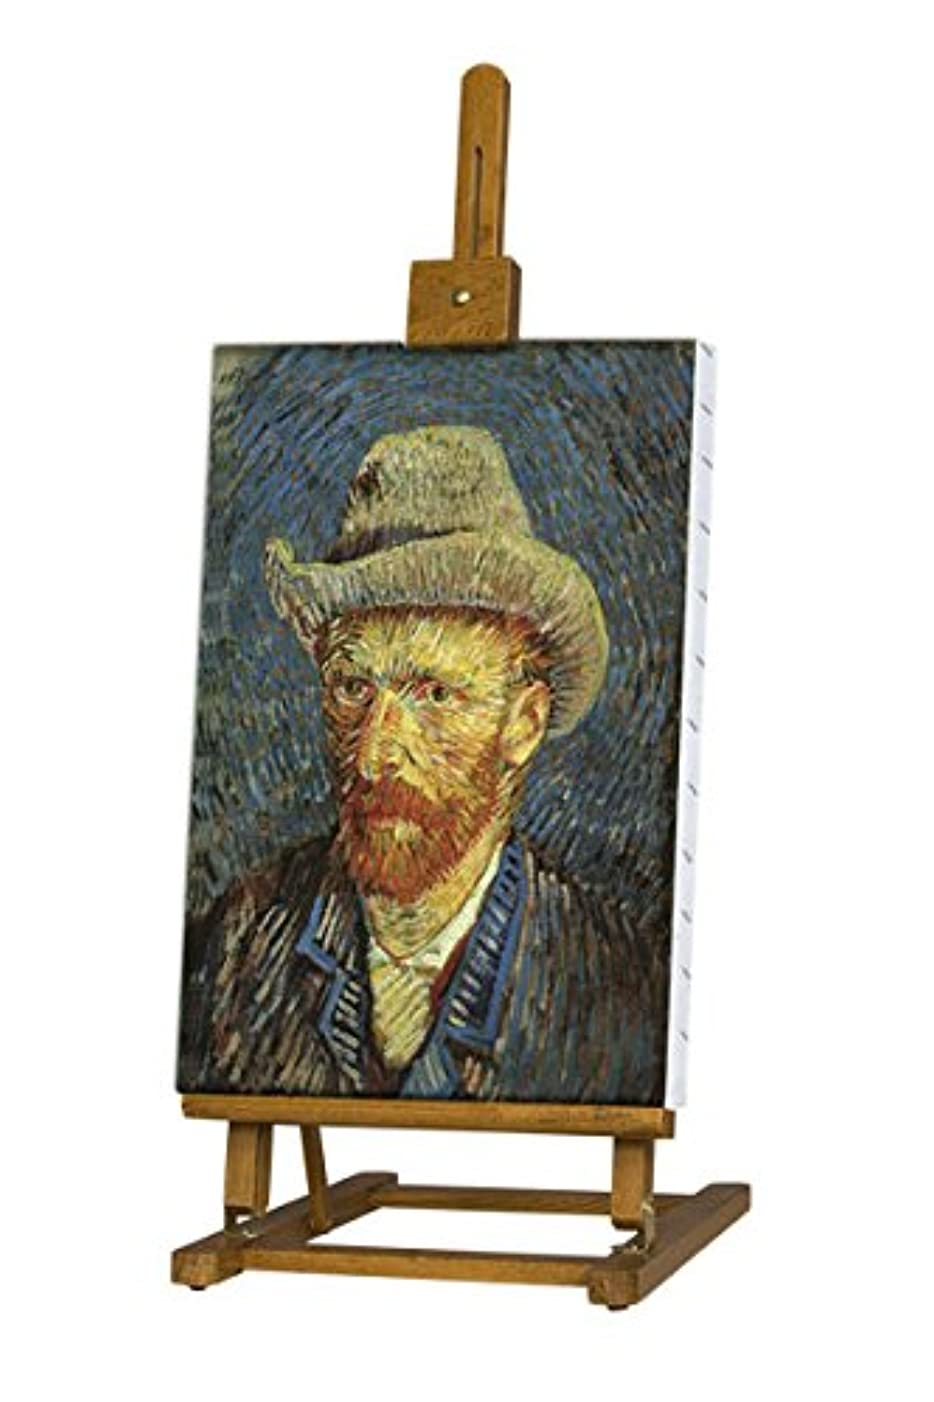 "Creative Mark Tabletop Artist Easel Van Gogh 29-38"" Tall Folding Display Easel, H-Frame Wood Studio Art Easel Perfect for Student Artists, Small Studios & Art Display - Oiled Beechwood Finish"